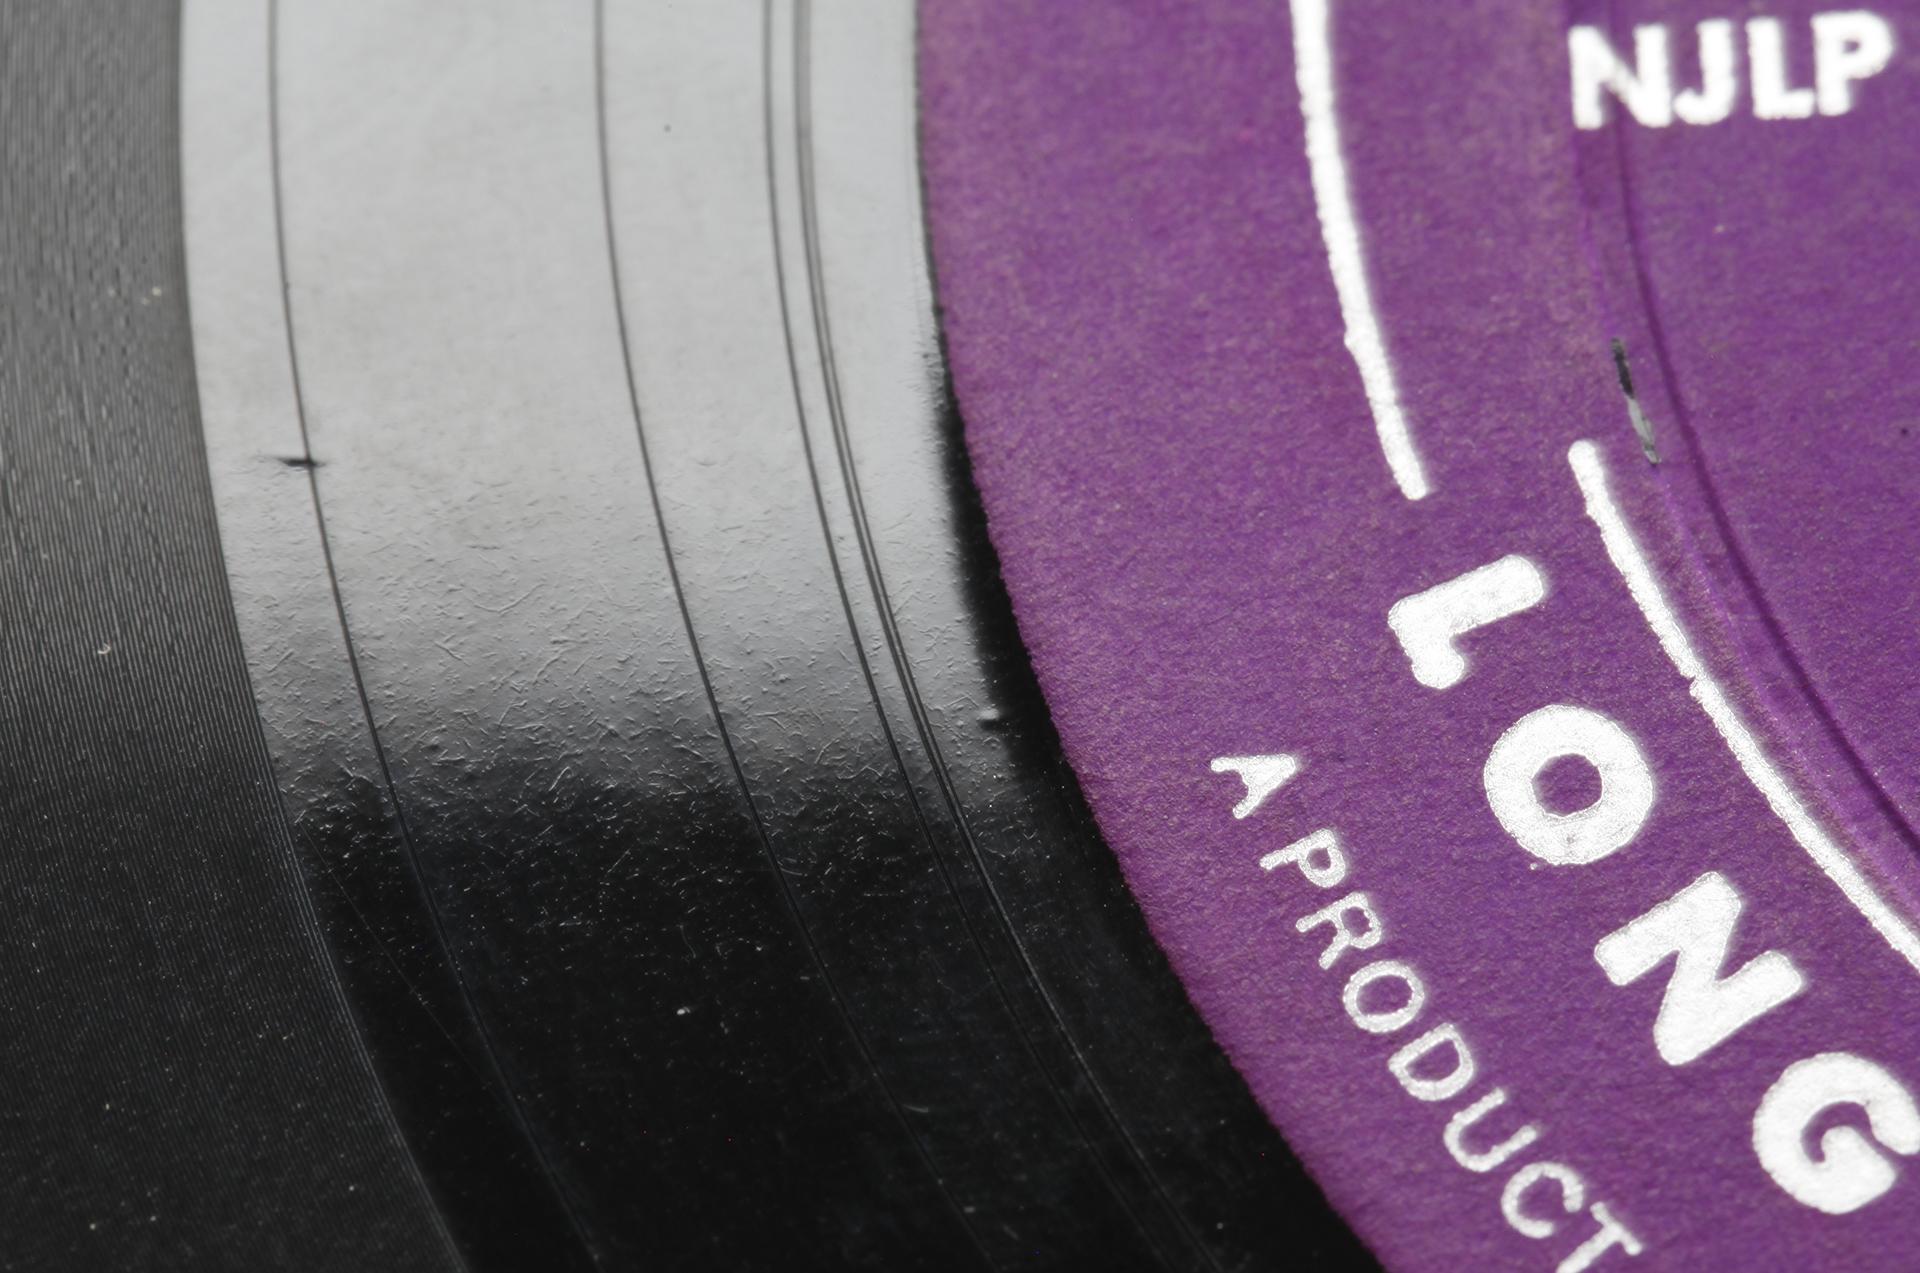 Recycled Vinyl Macro NJLP8254 Dickerson This Is Walt - 1929pxs LJC